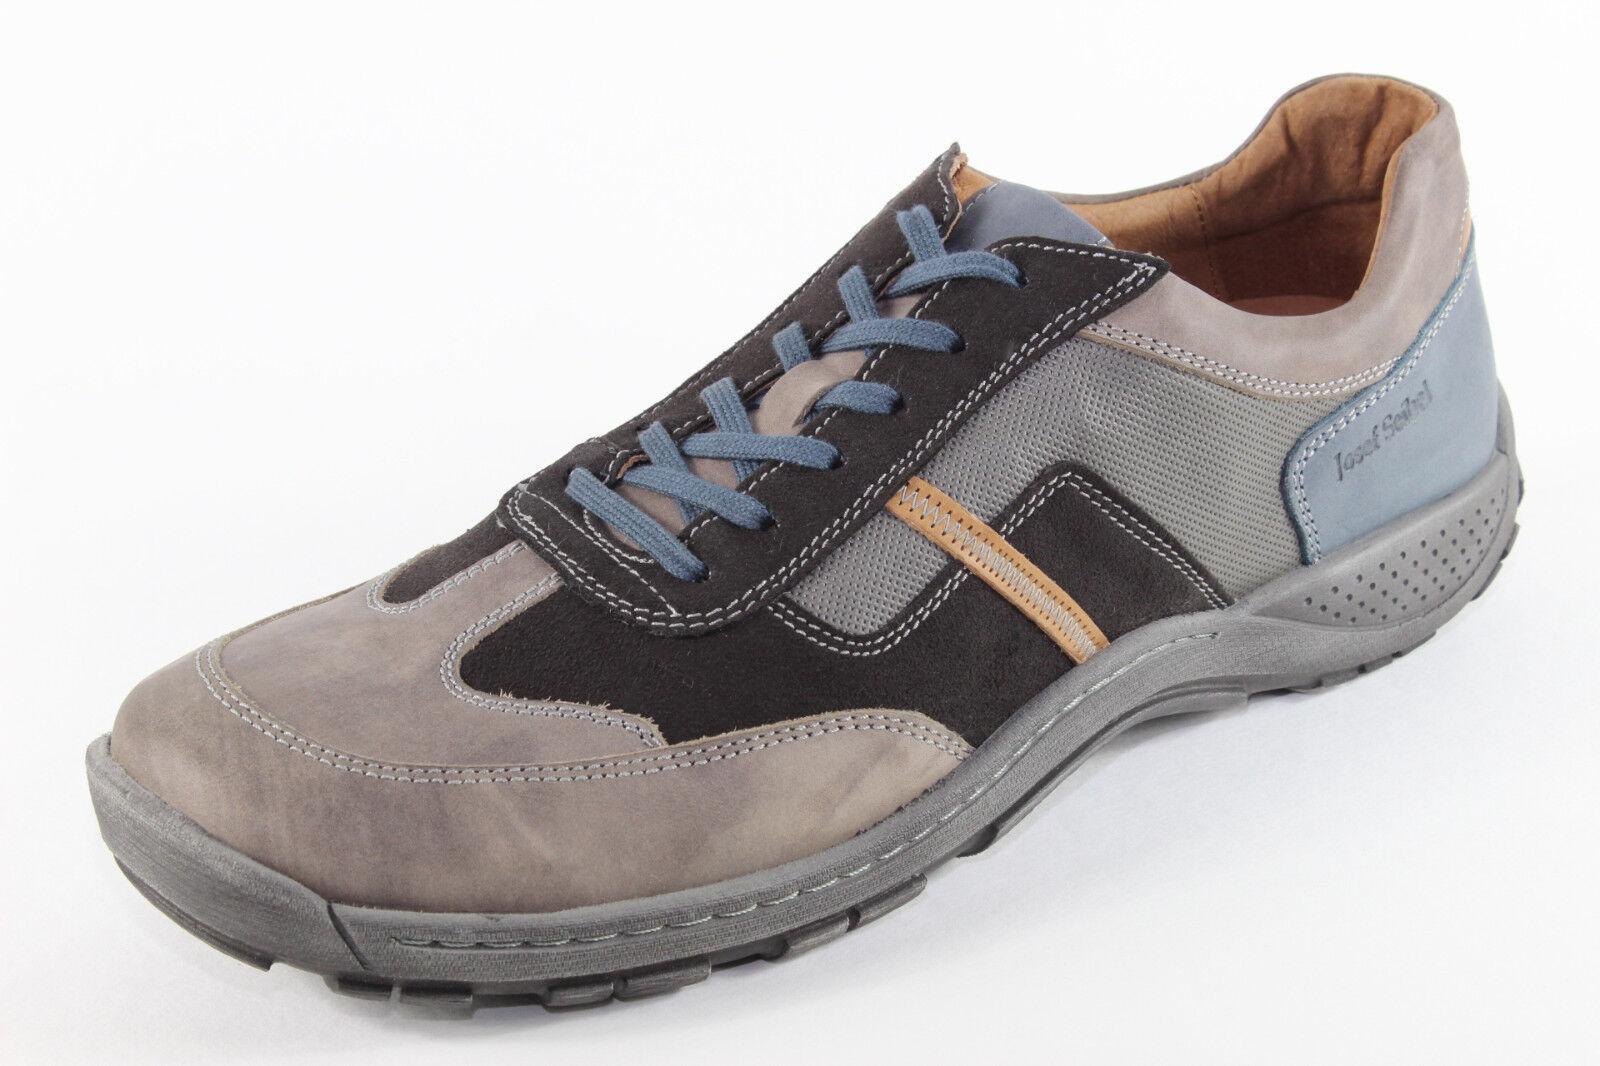 Josef Seibel Nolan 28, Sneaker in schöner Lederkombi, Herrenschuhe *Übergröße*